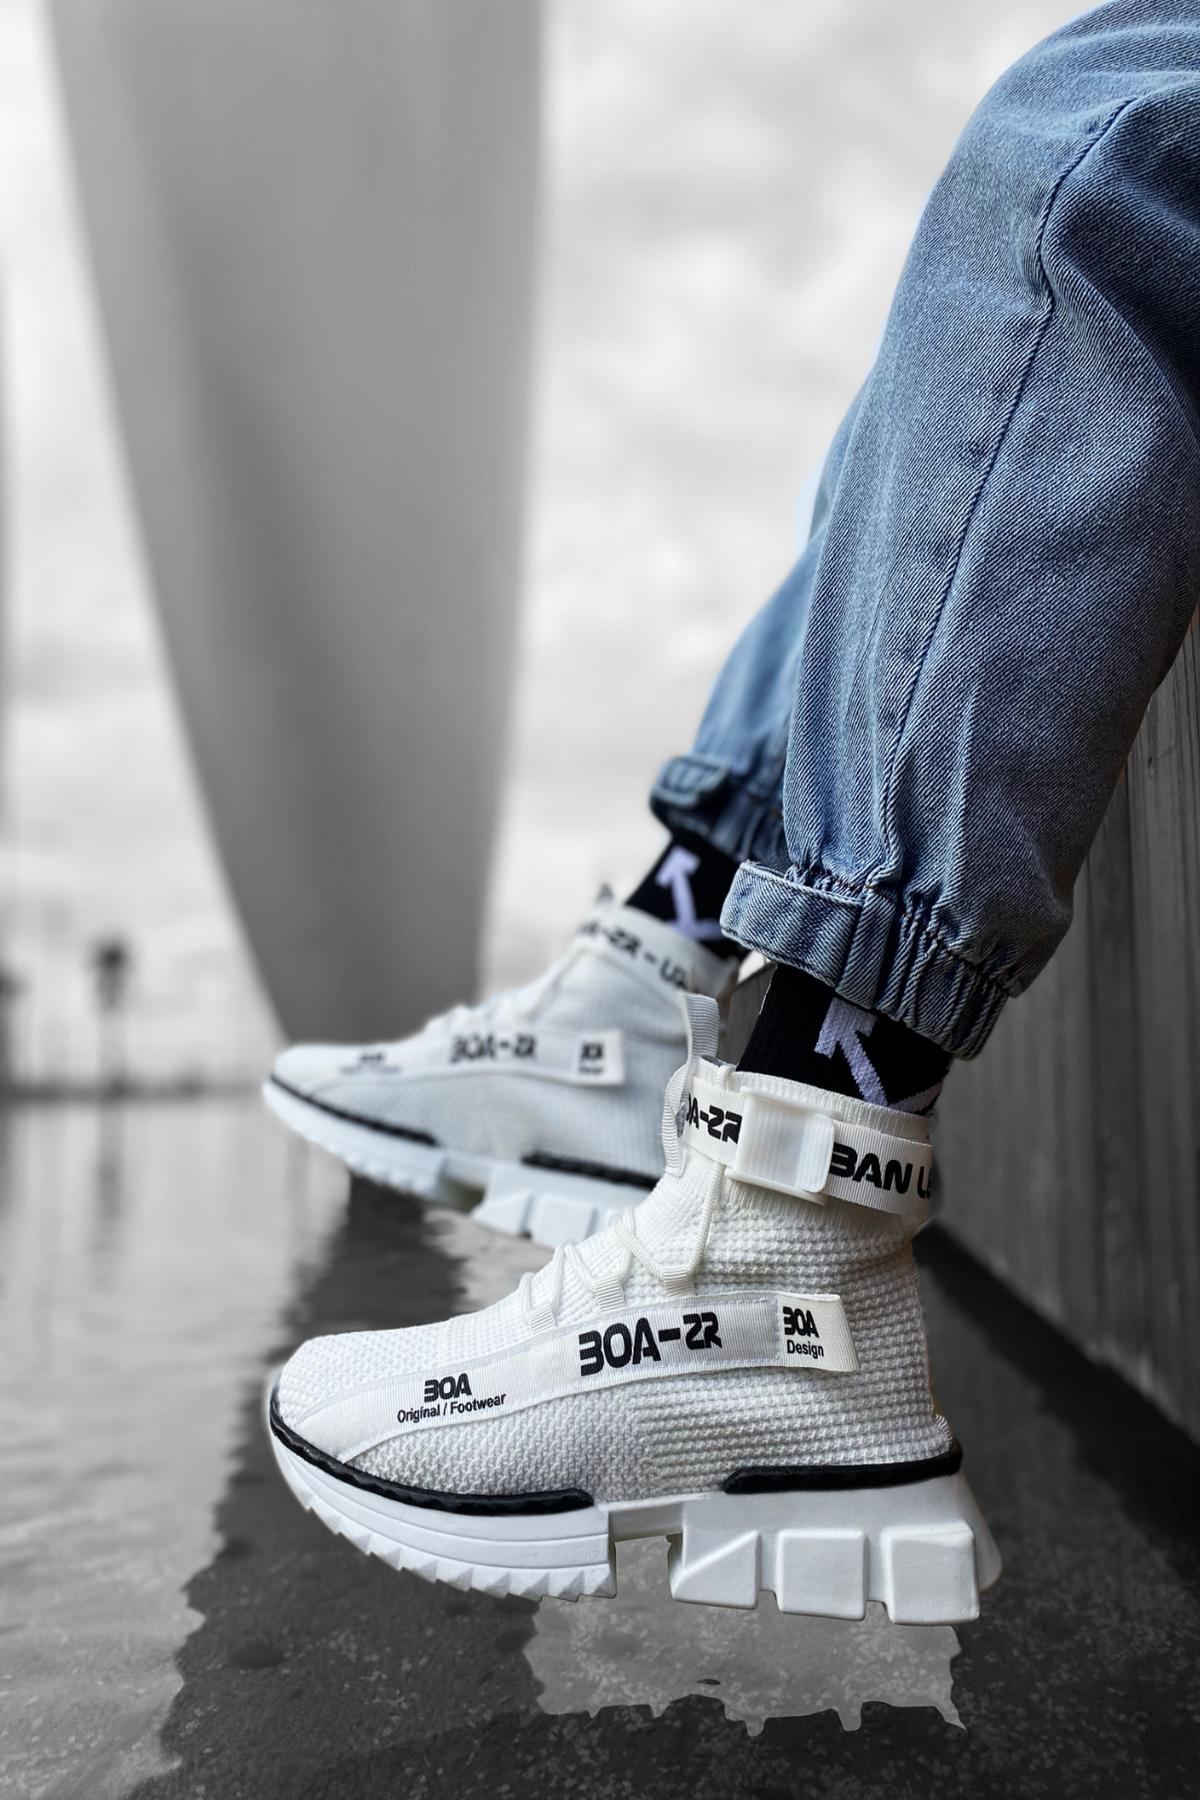 B700 Beyaz Erkek Sneakers